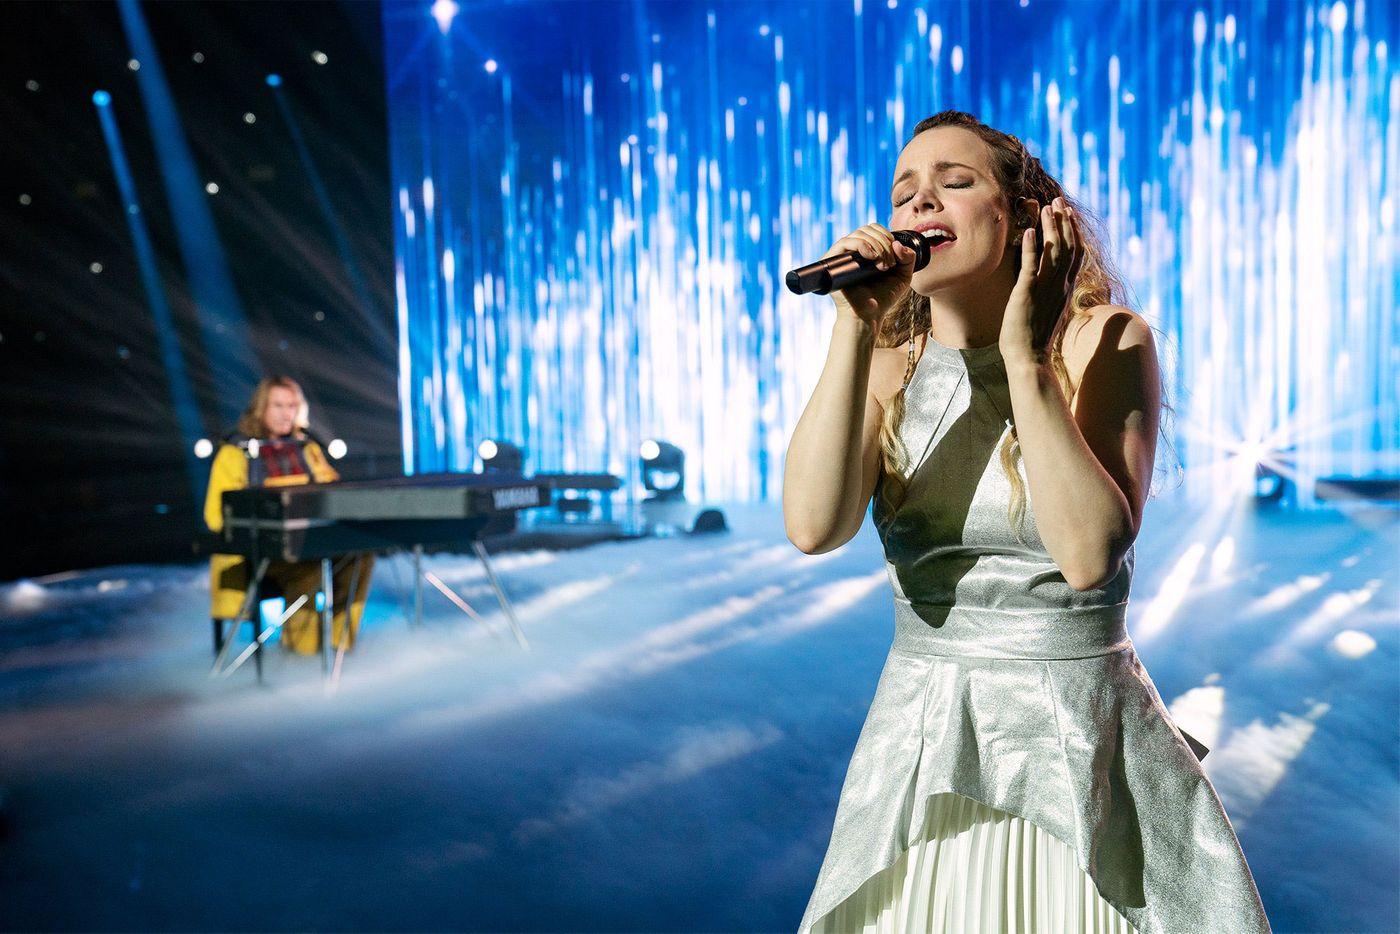 dbe3ce41f34cdd46a3a52bcc478d50eb0d-eurovision.2x.rhorizontal.w700